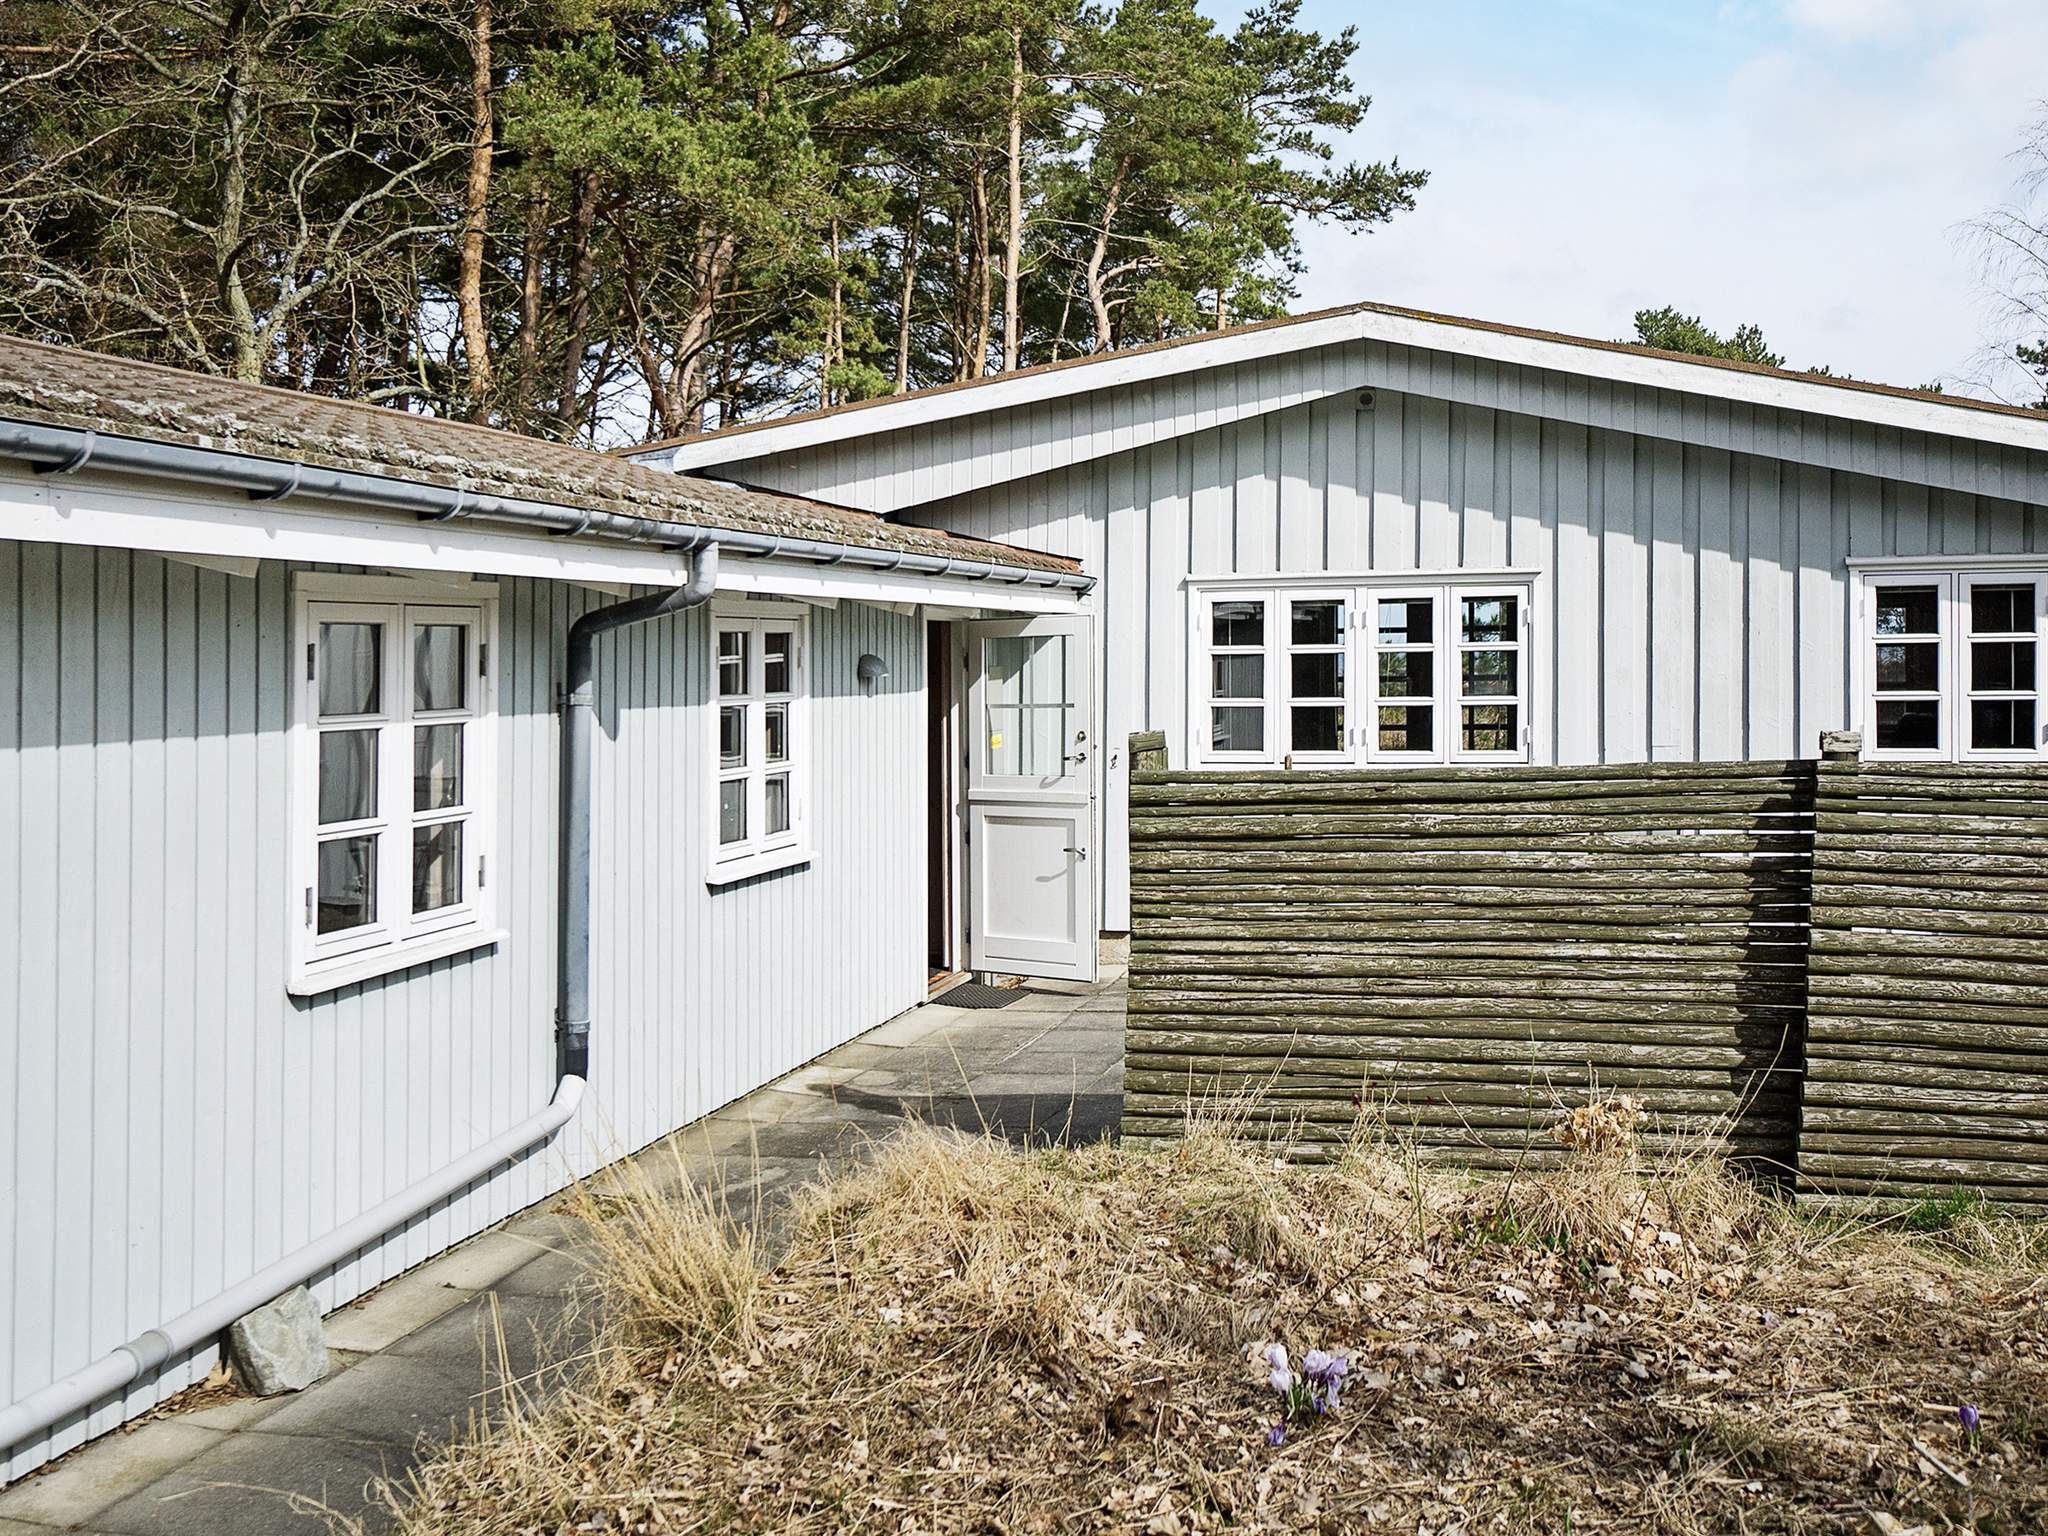 Ferienhaus Balka Strand (493388), Balke, , Bornholm, Dänemark, Bild 4